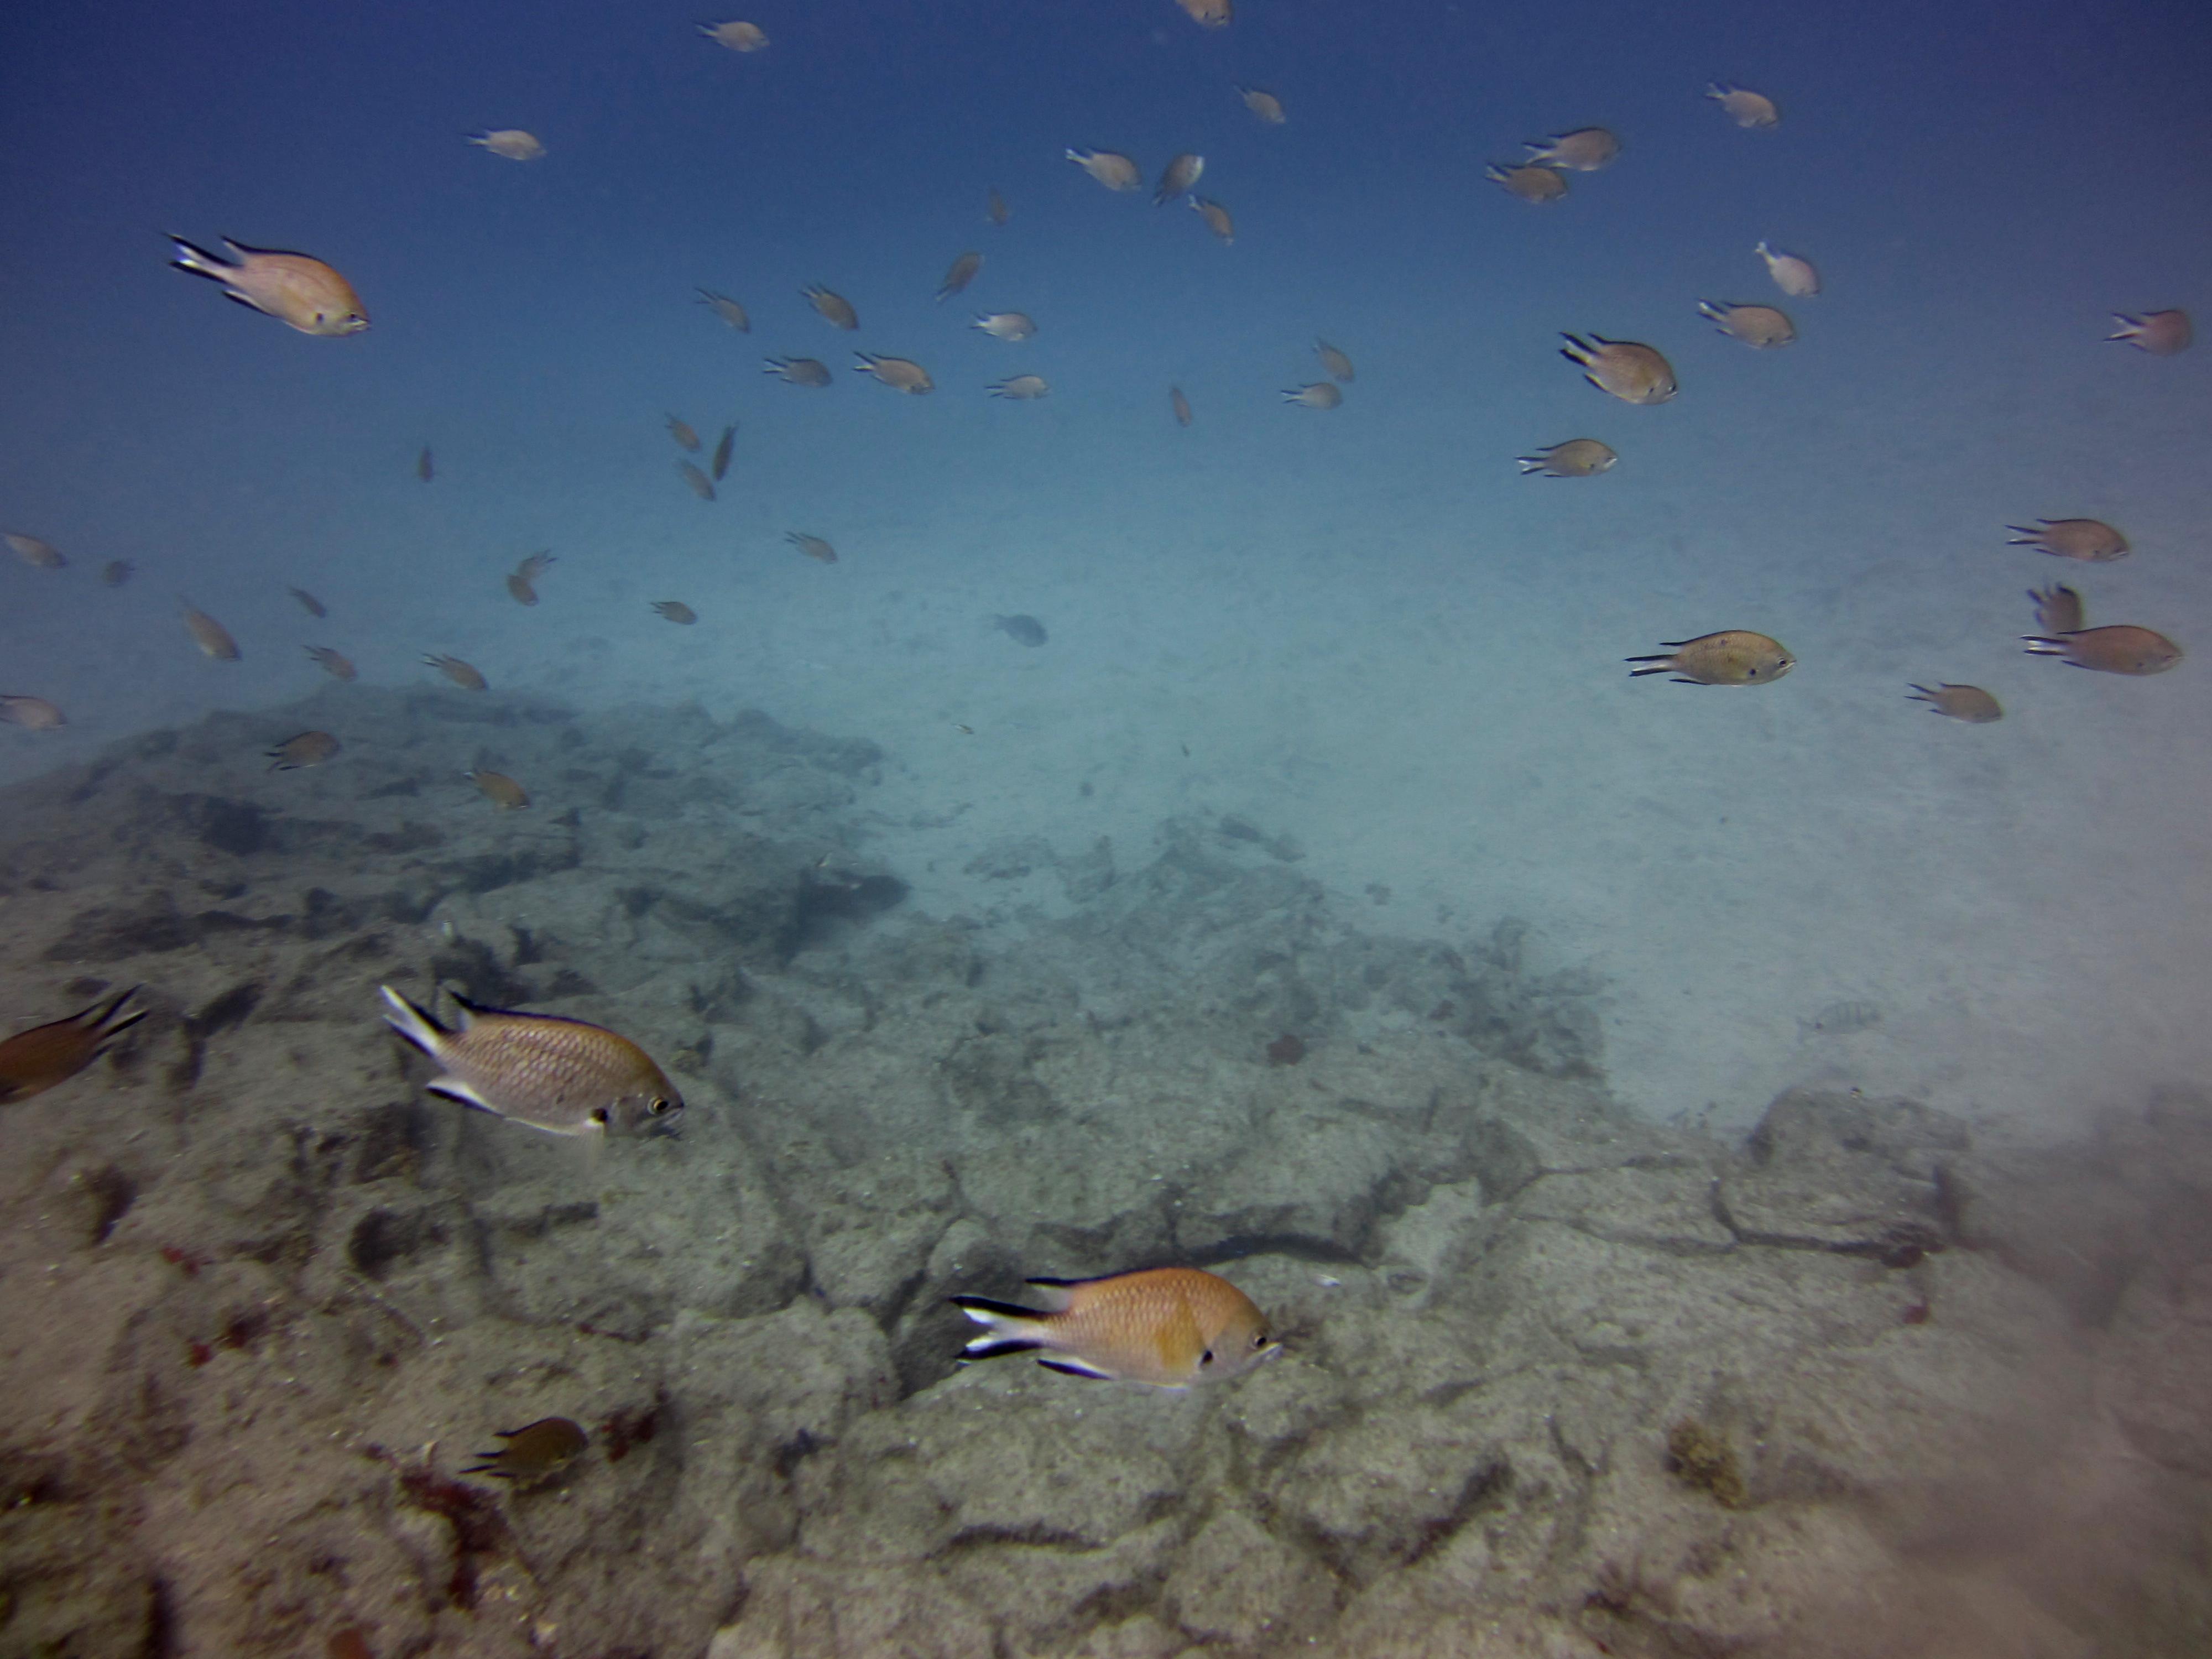 Diving-Tenerife-Aquatic-Life-Sharks-Sting-Rays-Fish (51)